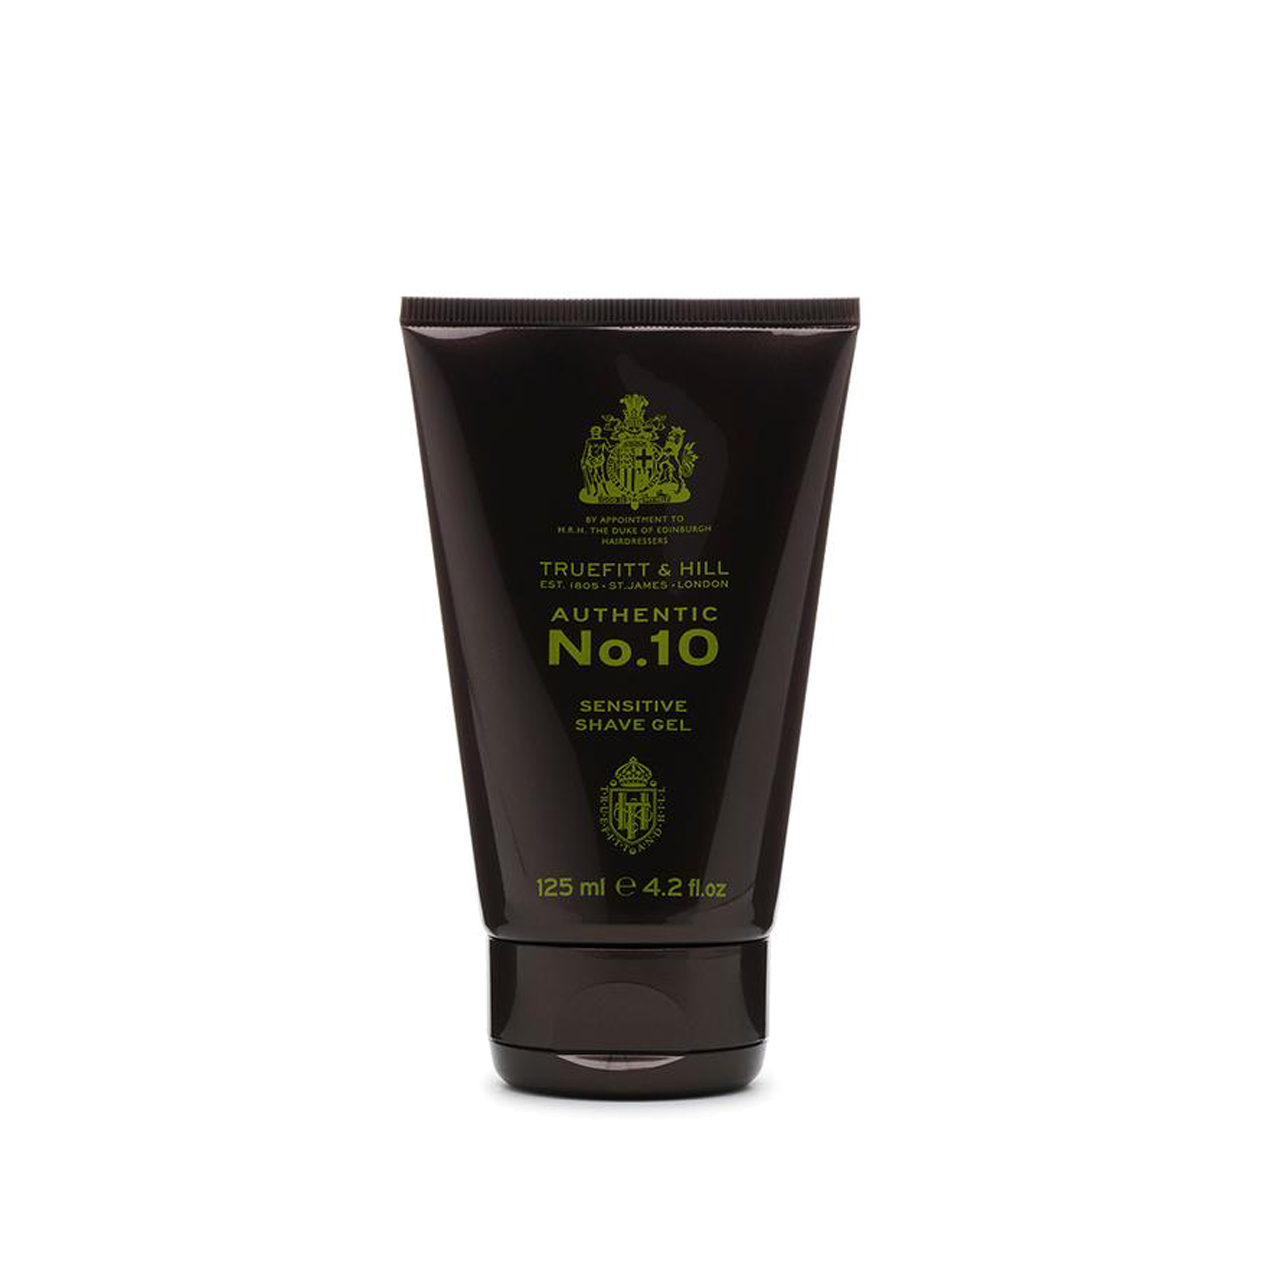 Authentic N°10 - Sensitive Shaving Gel